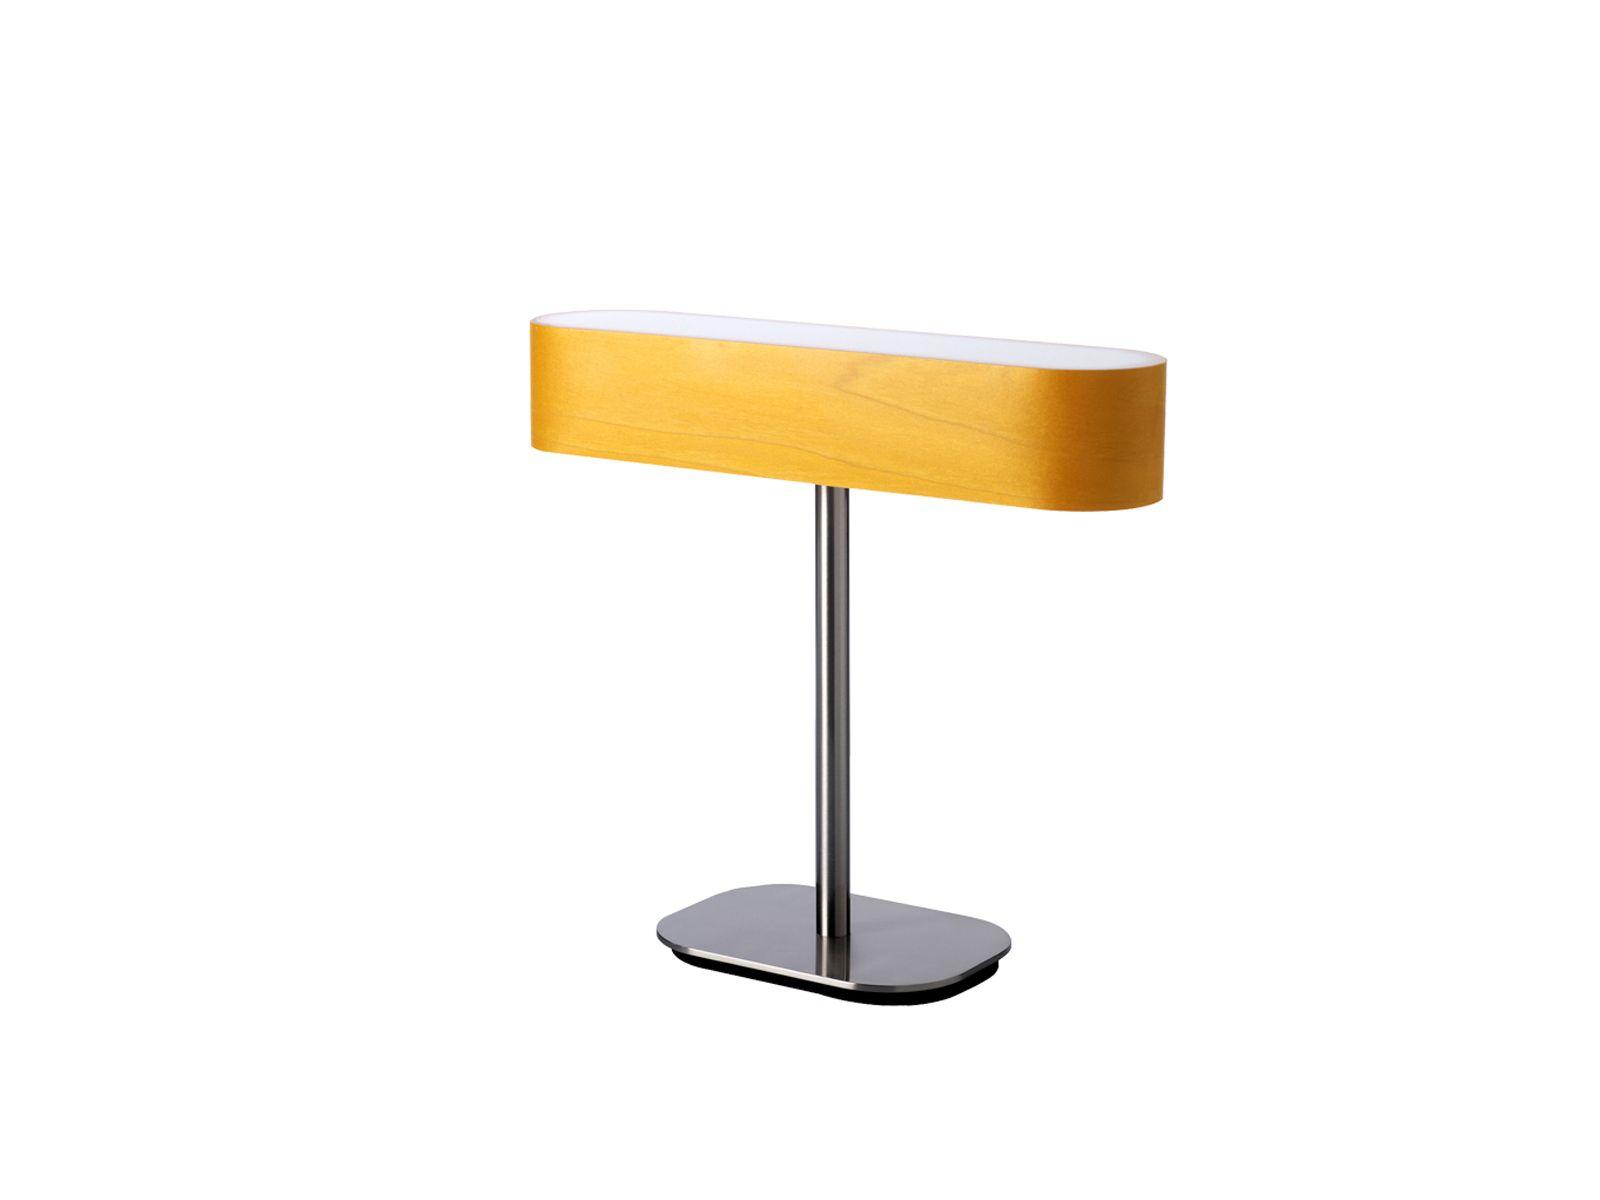 Handmade table lamp i club m by lzf design burkhard d mmer - Handmade table lamp ...